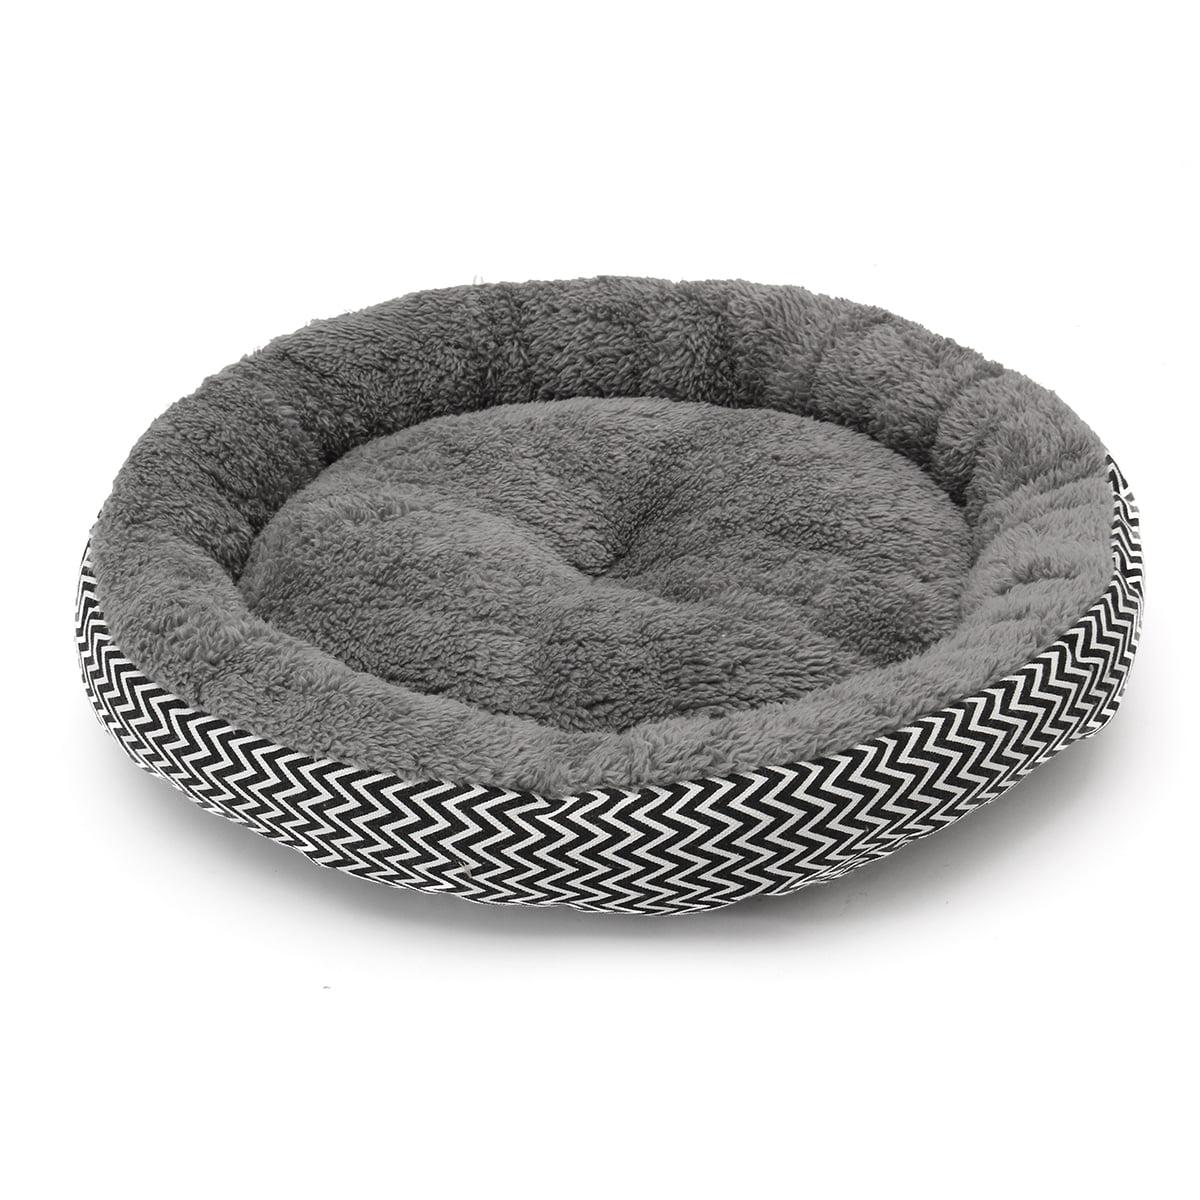 Pet Dog Puppy Cat Kitten Warm Pad House Pet Nest Mat Pad Basket Sleeping Cushion